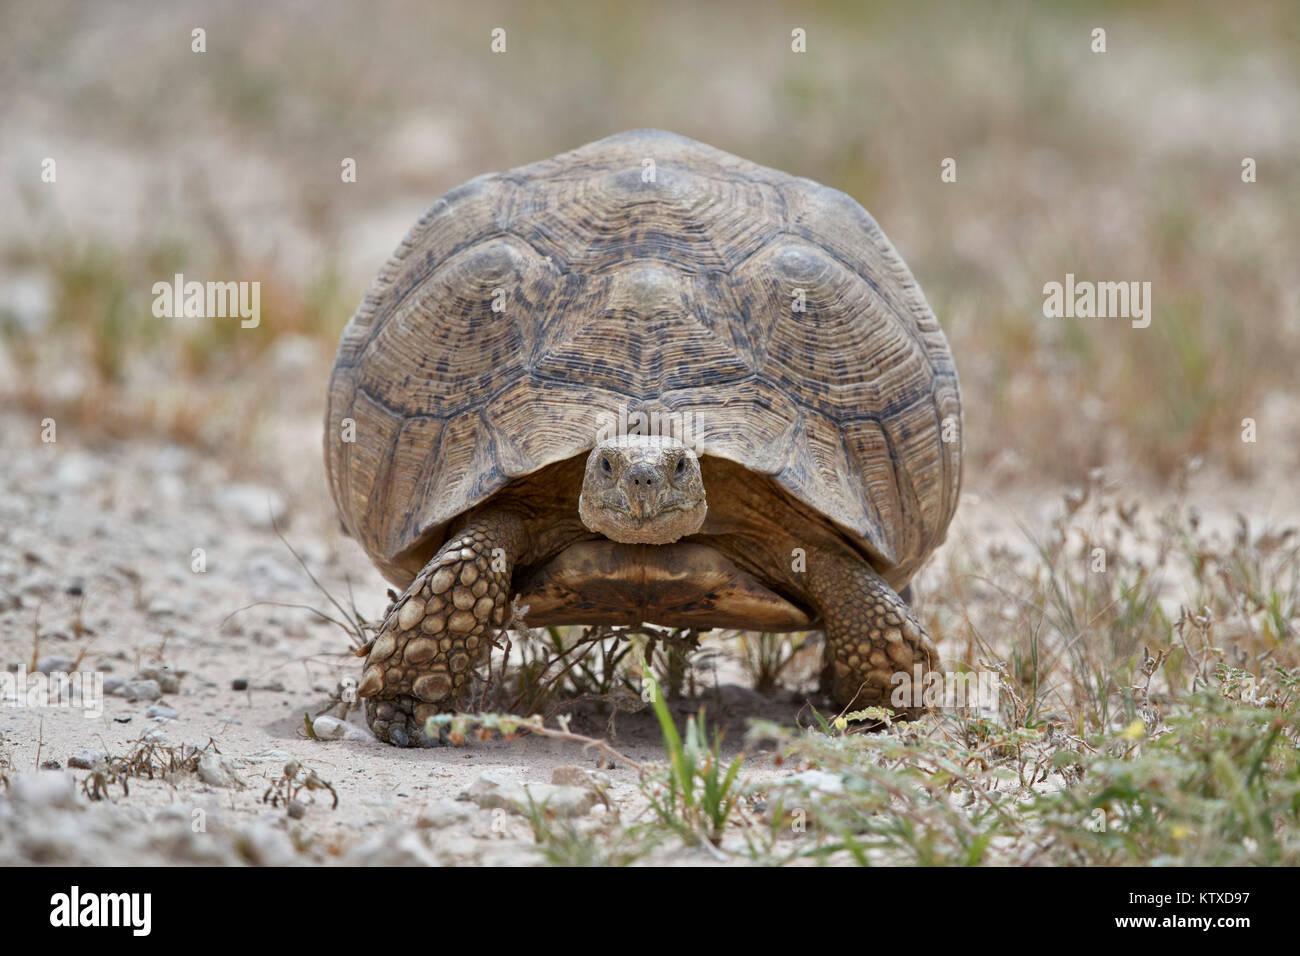 Leopard tortoise (Geochelone pardalis), Kgalagadi Transfrontier Park, South Africa, Africa - Stock Image